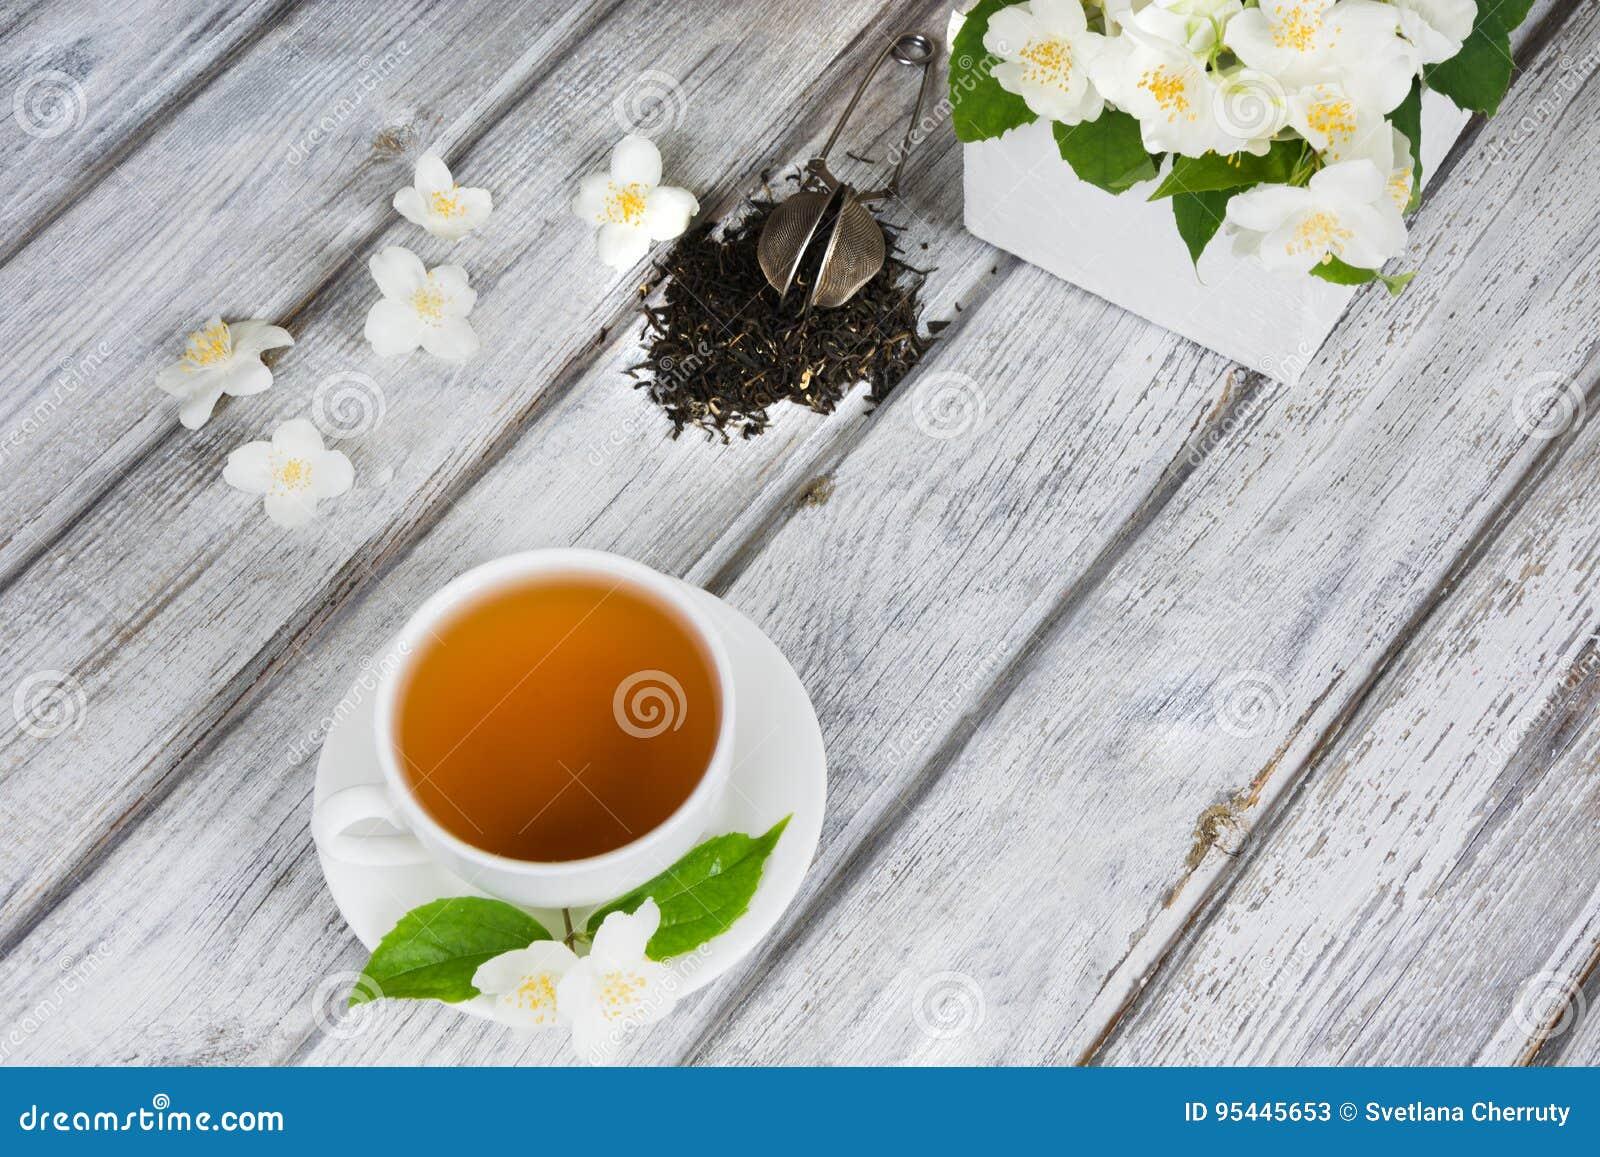 Jasmine dry green tea leaves with fresh jasmine flowers and white royalty free stock photo download jasmine dry green tea leaves with fresh jasmine flowers izmirmasajfo Gallery